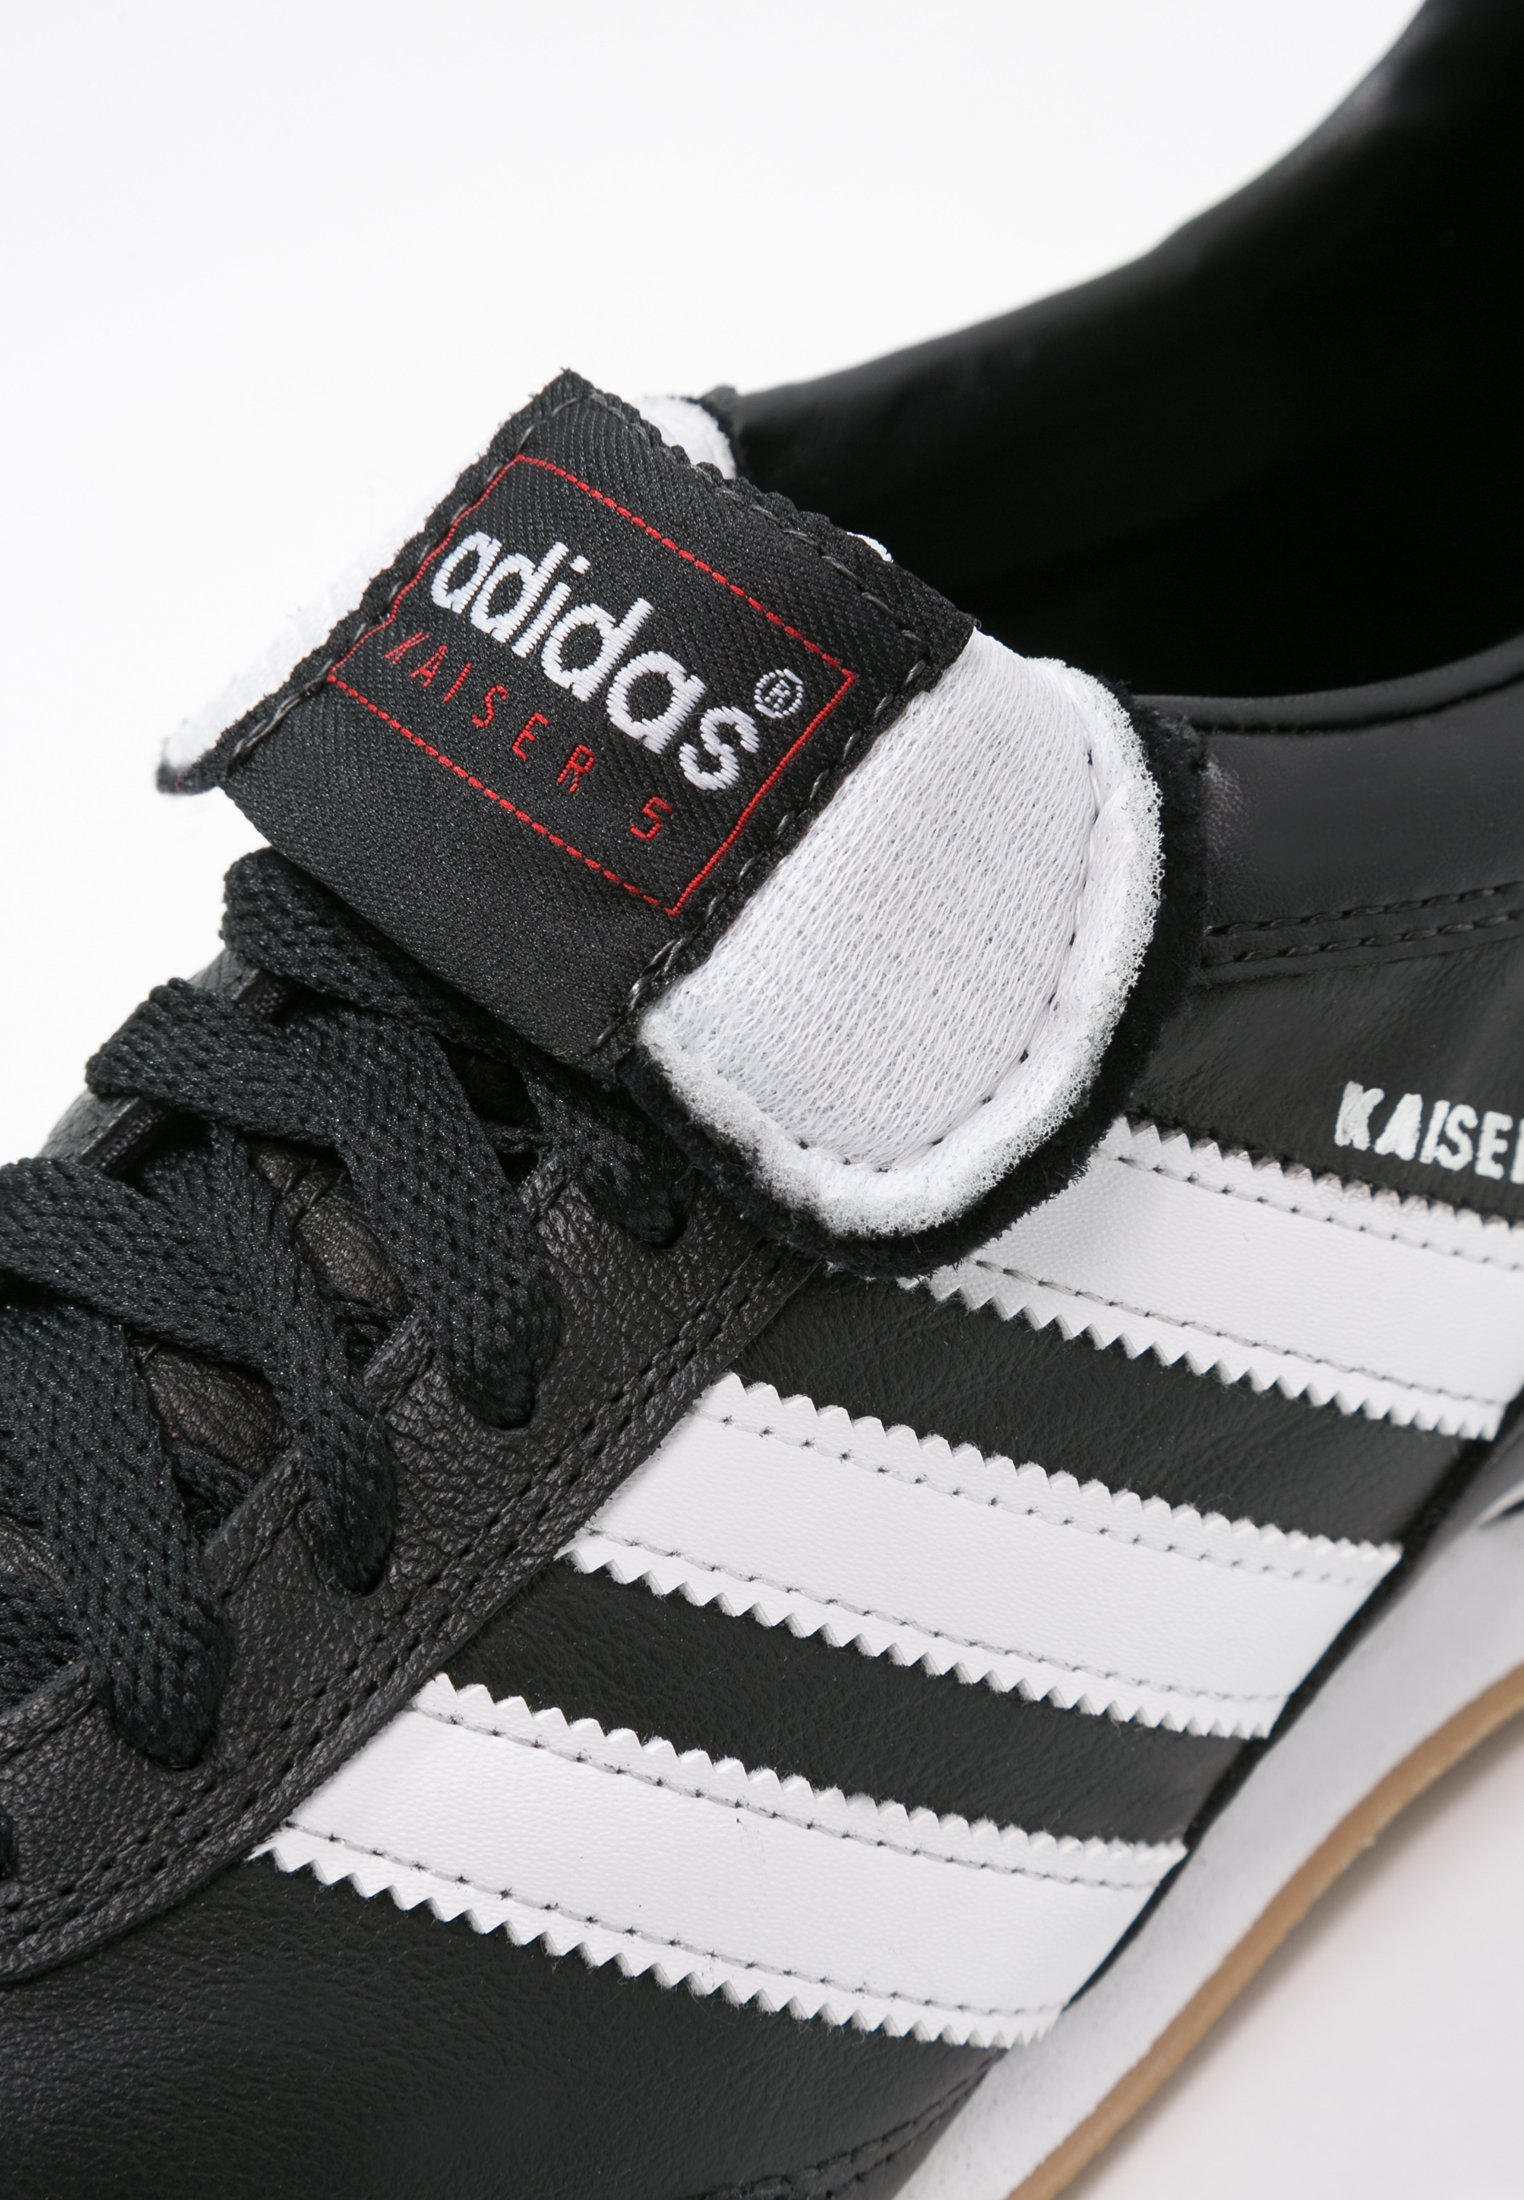 Baskets basses Adidas Kaiser 5 Goal Blanc pour Hommes 43 13